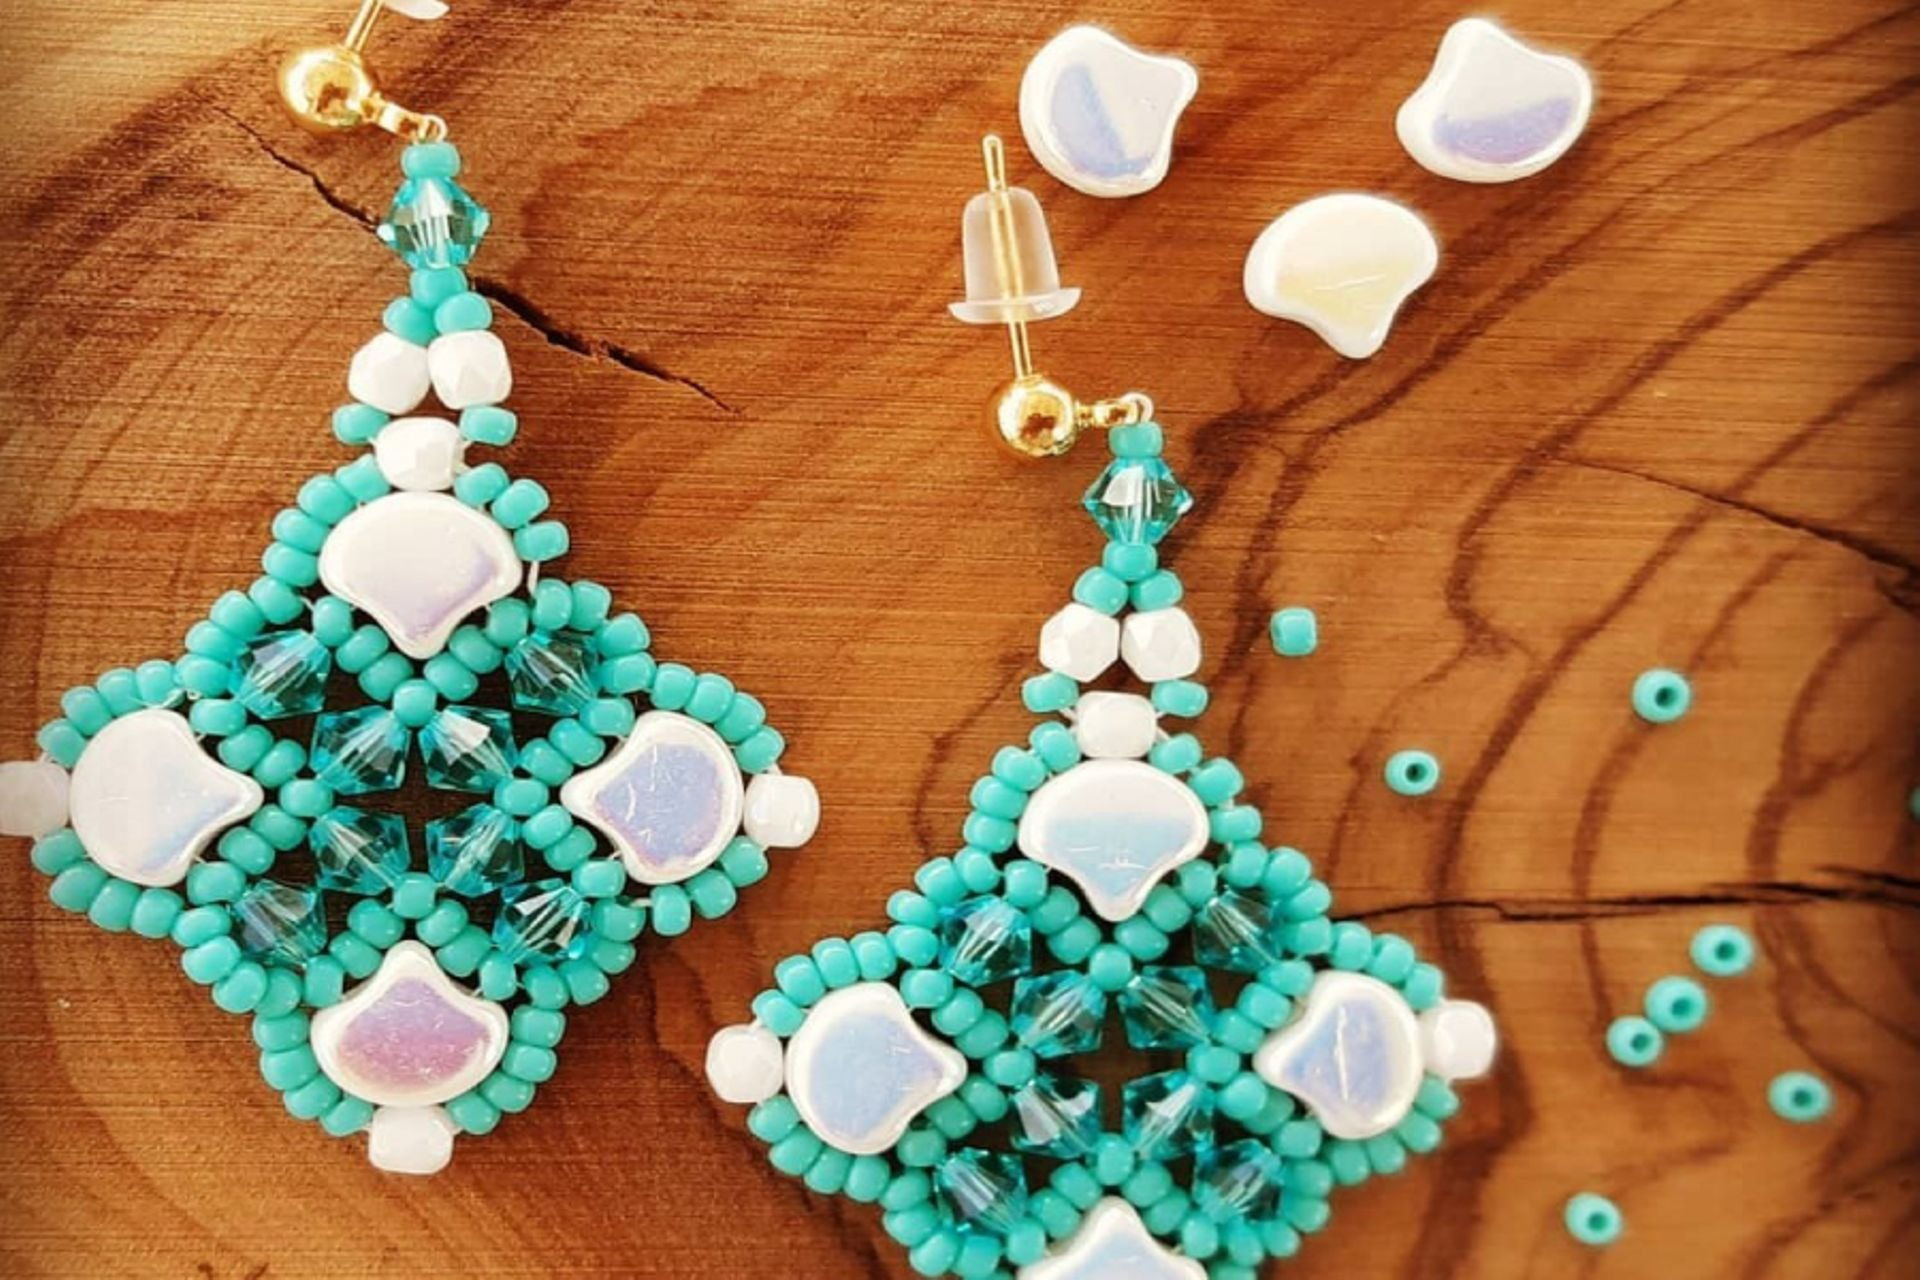 6 lantana beads jewelry designer תְמוּנָה